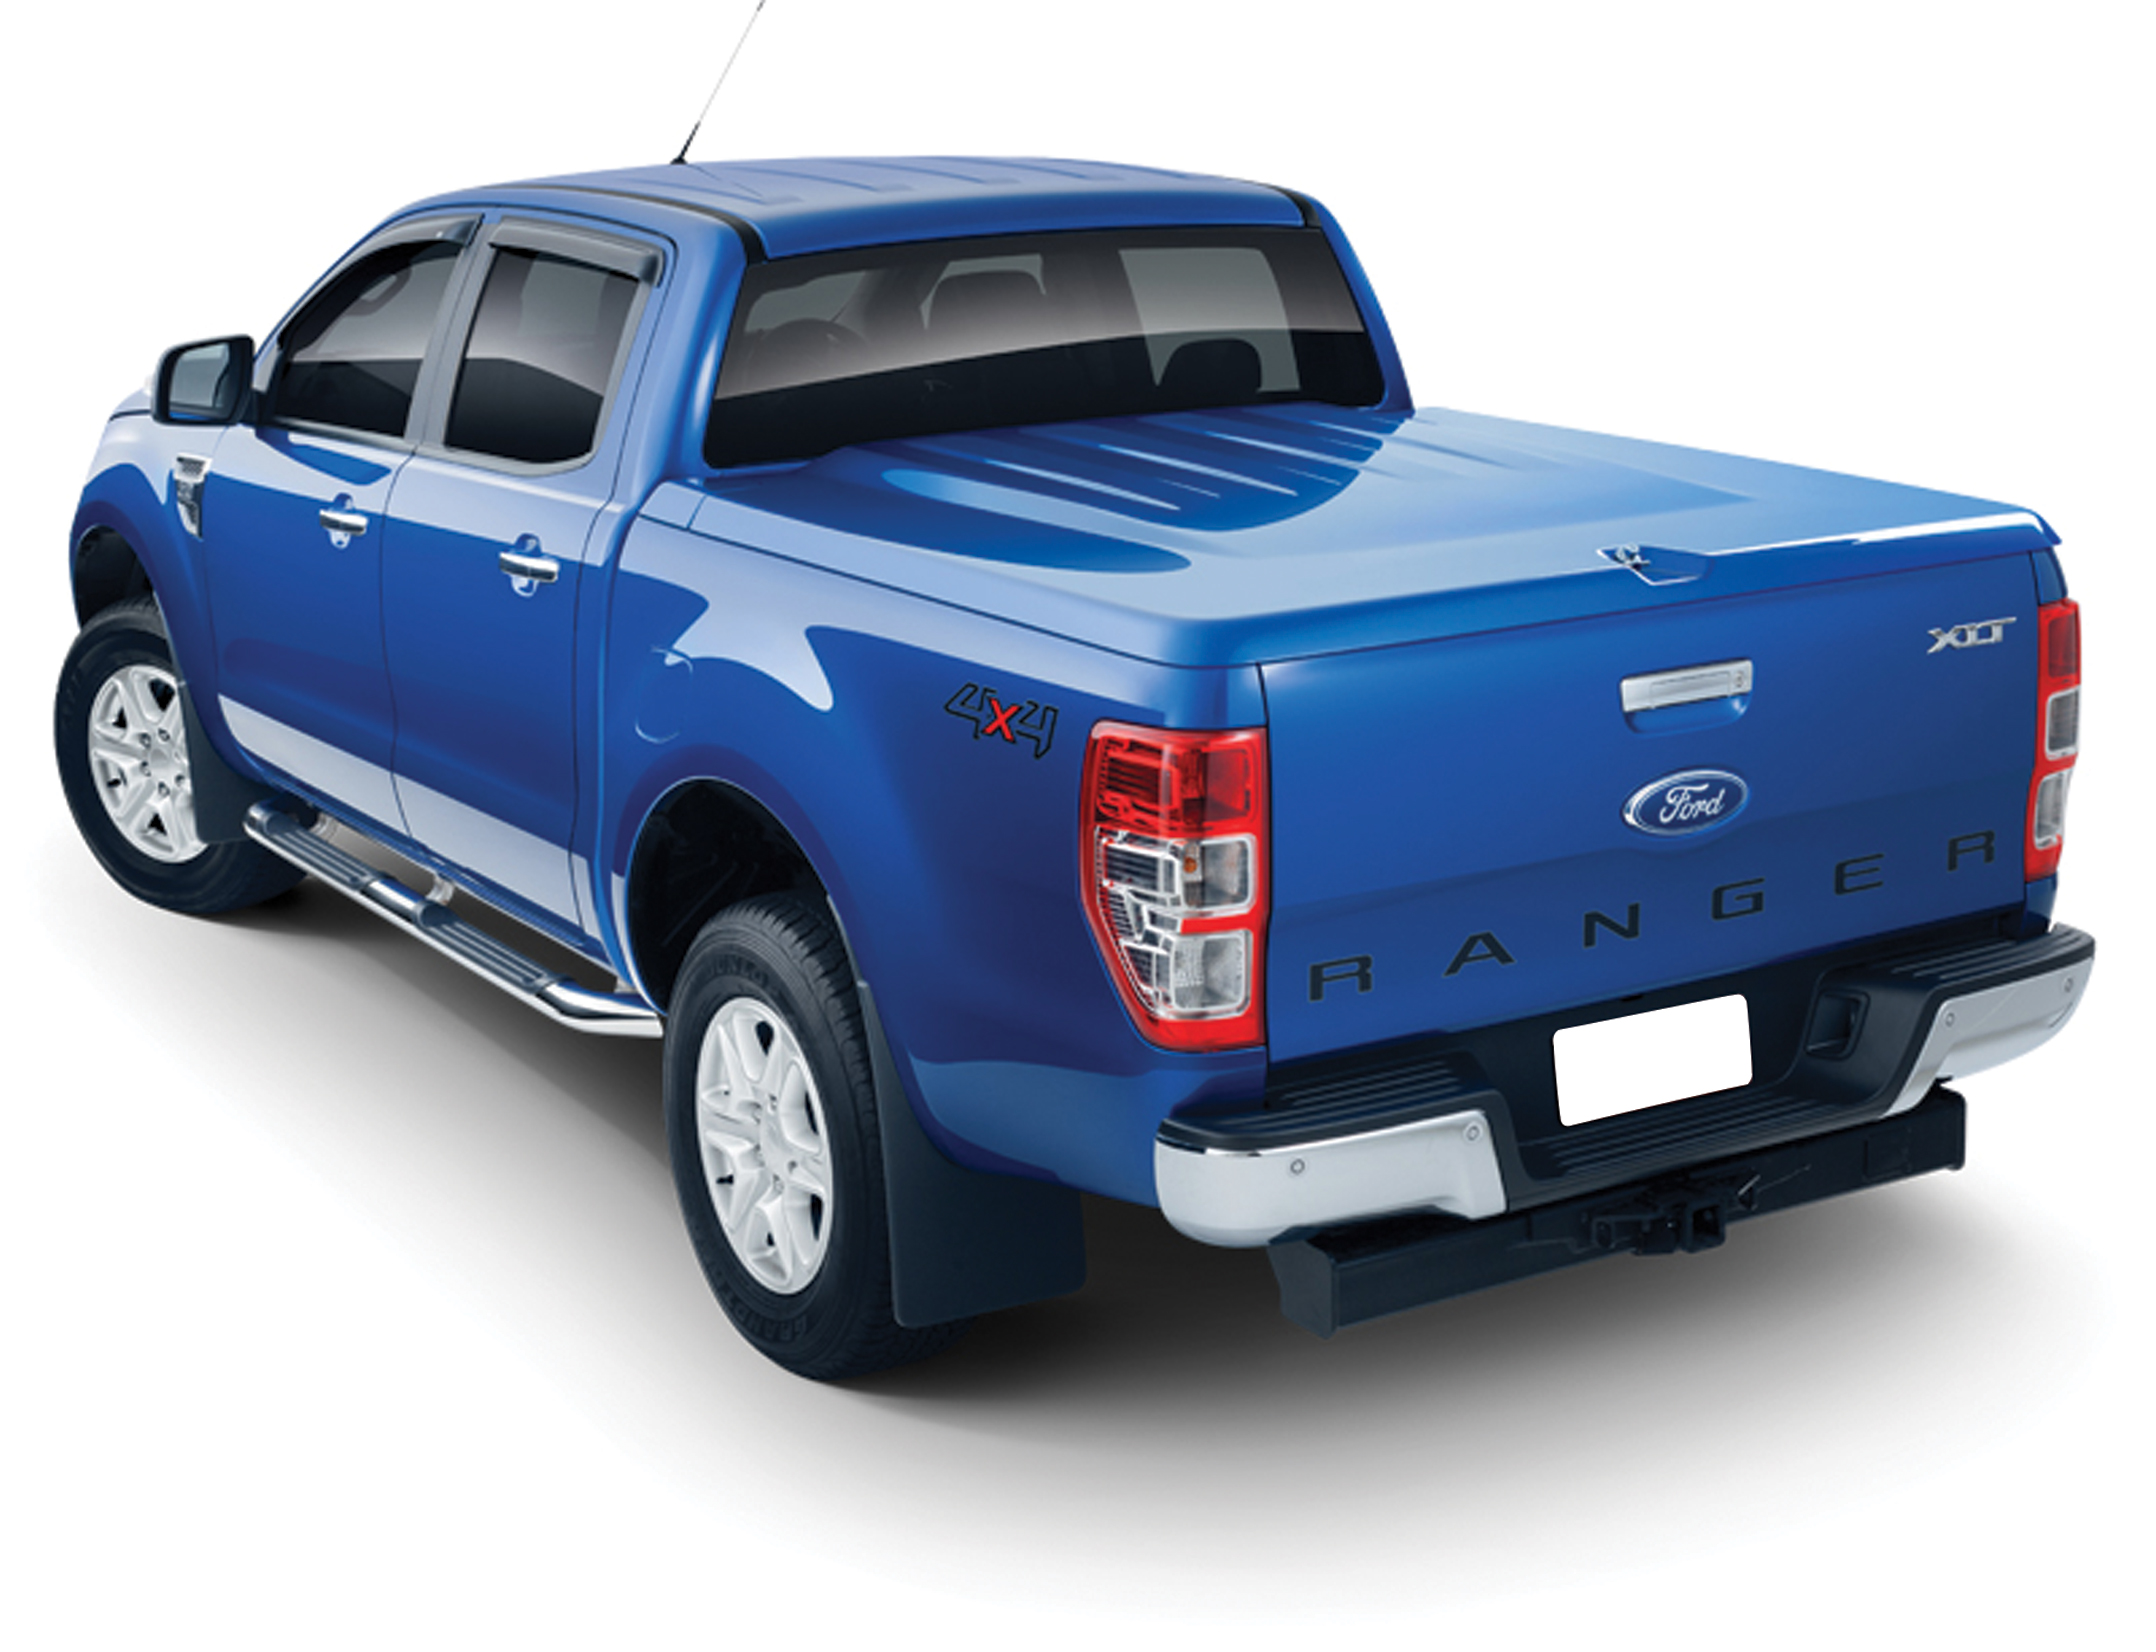 tcf39a tonneau cover egr abs1 ford ranger 2012 dcab bleu 39a ford ranger. Black Bedroom Furniture Sets. Home Design Ideas